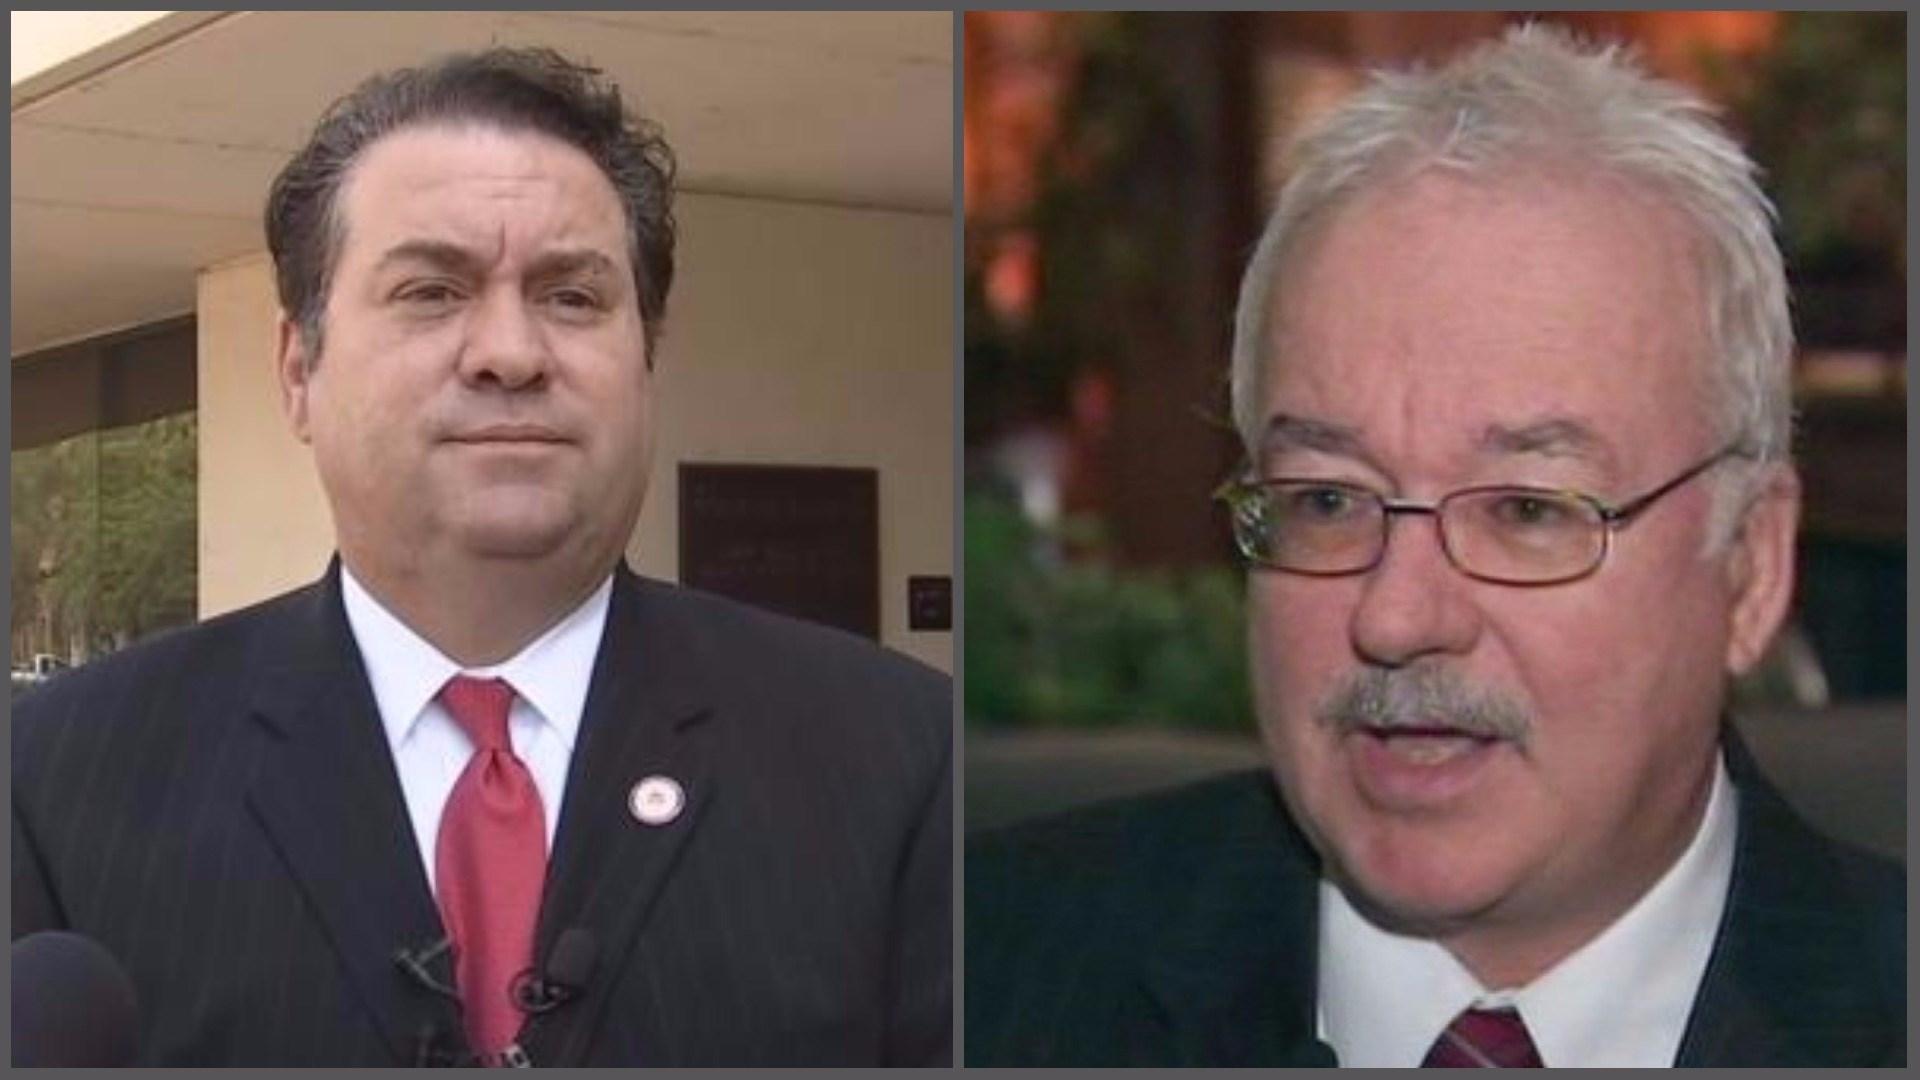 Arizona Attorney General Mark Brnovich (left) and State Sen. John Kavanagh (Source: 3TV/CBS 5 file photos)